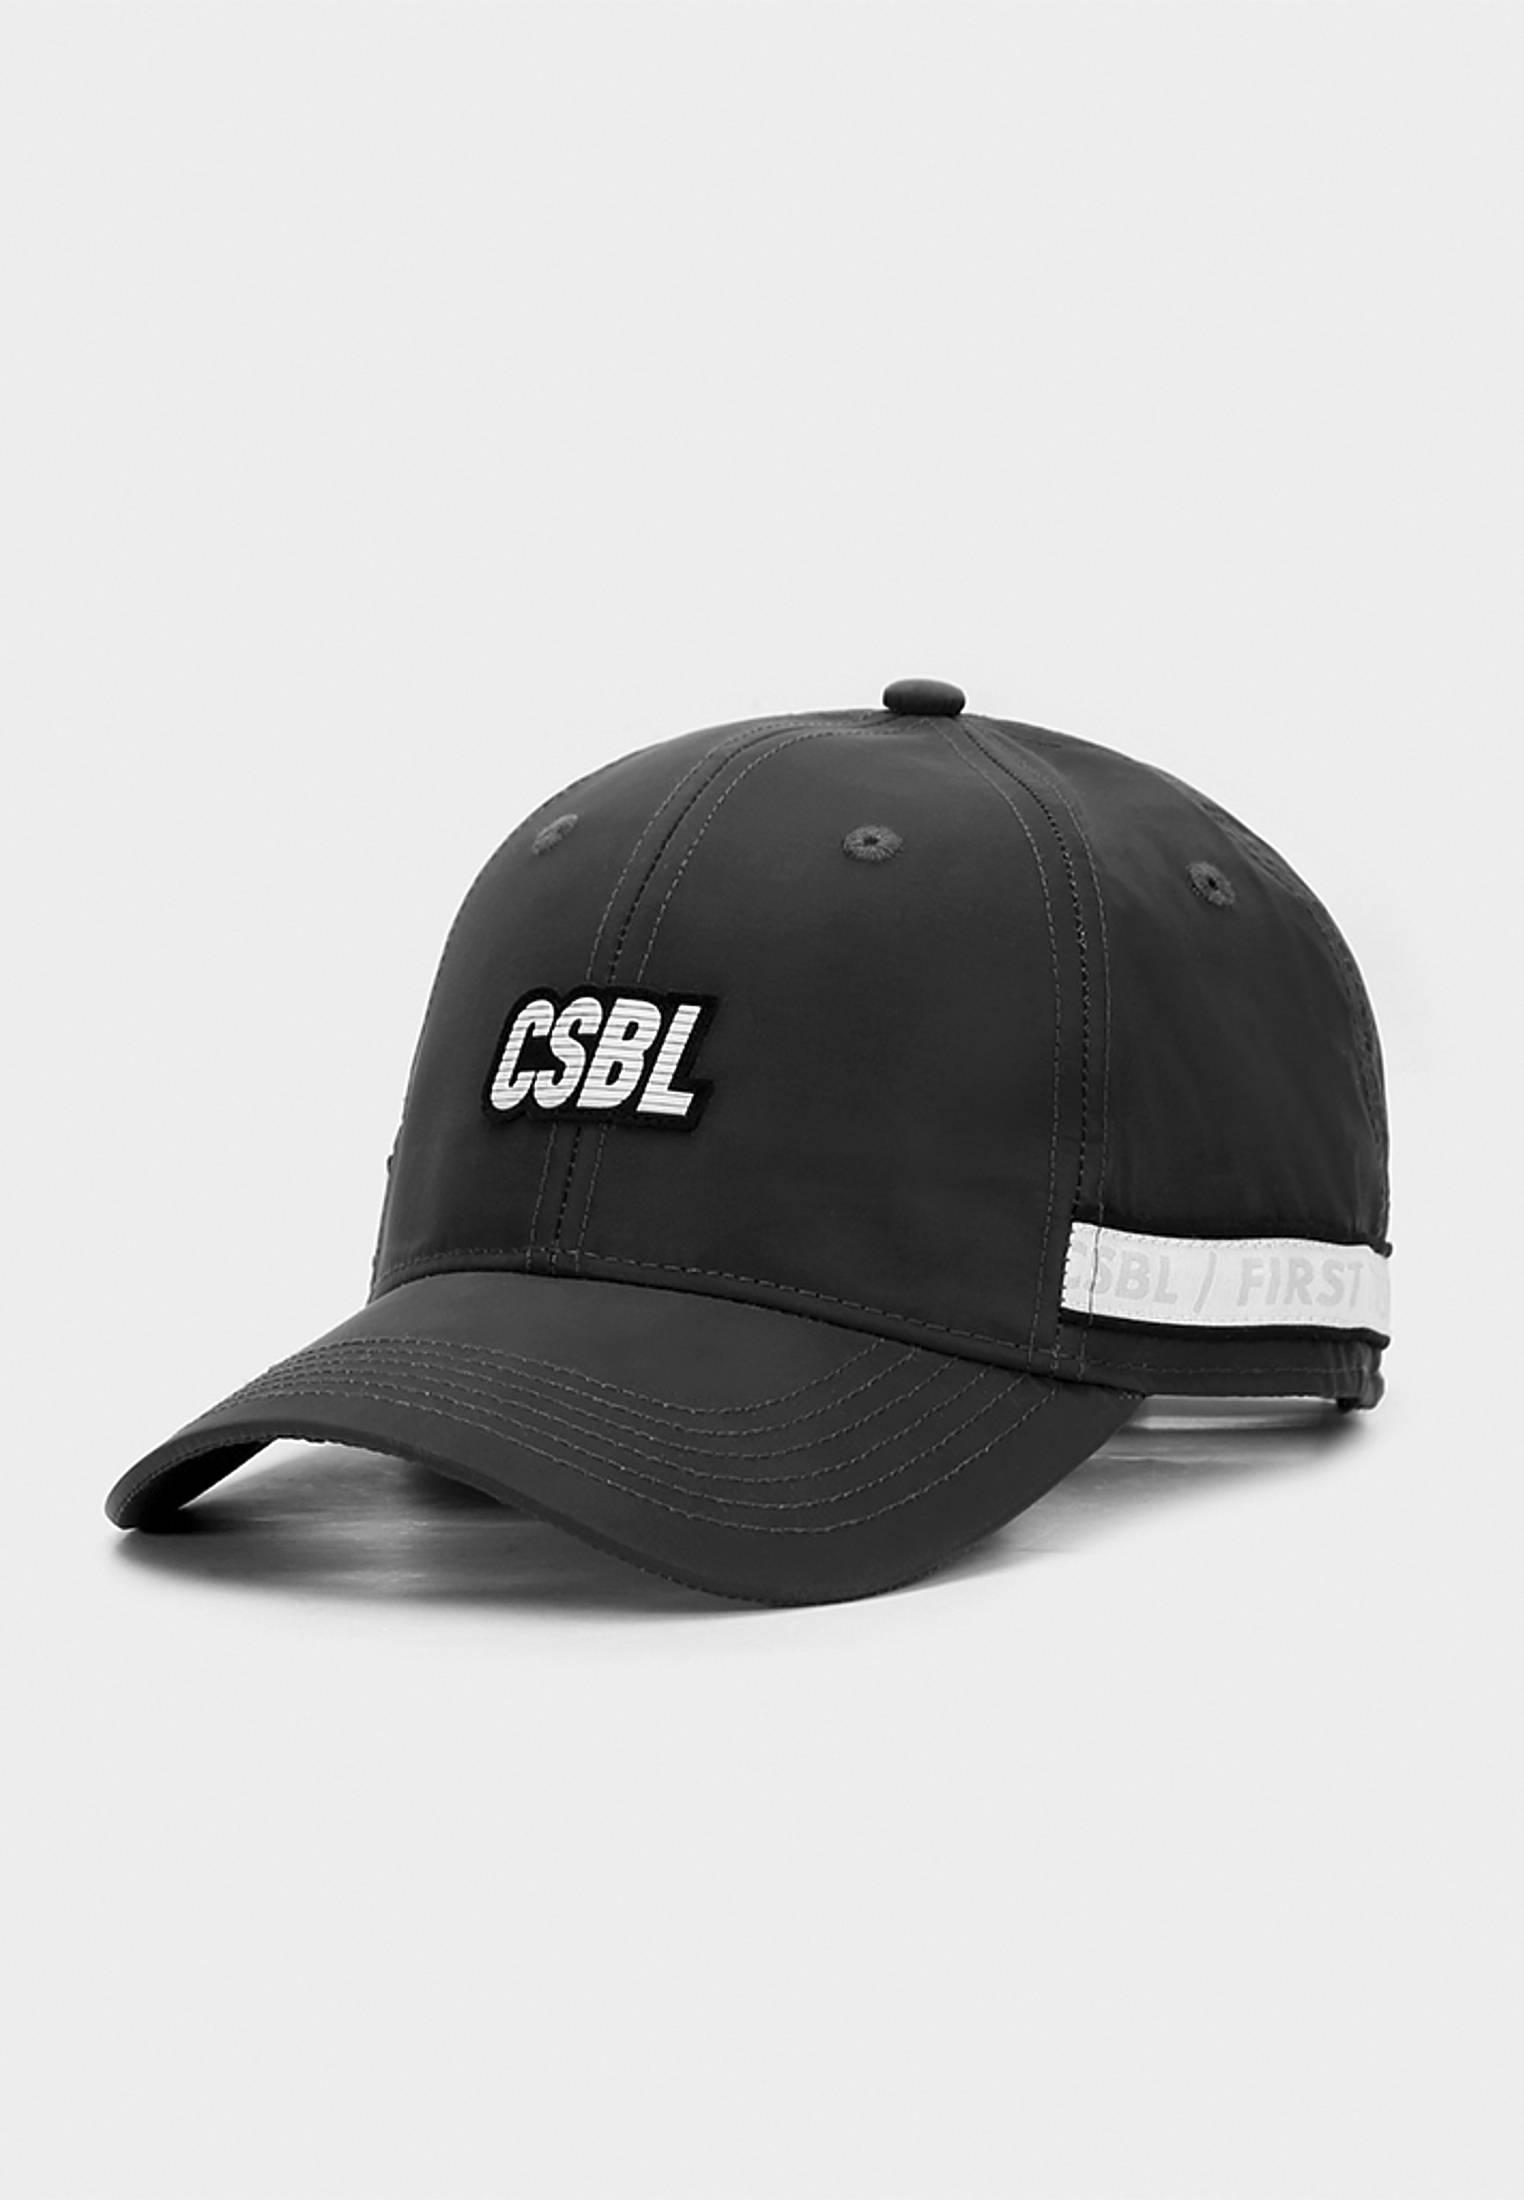 Urban Classics CSBL First Division Curved Cap black - One Size